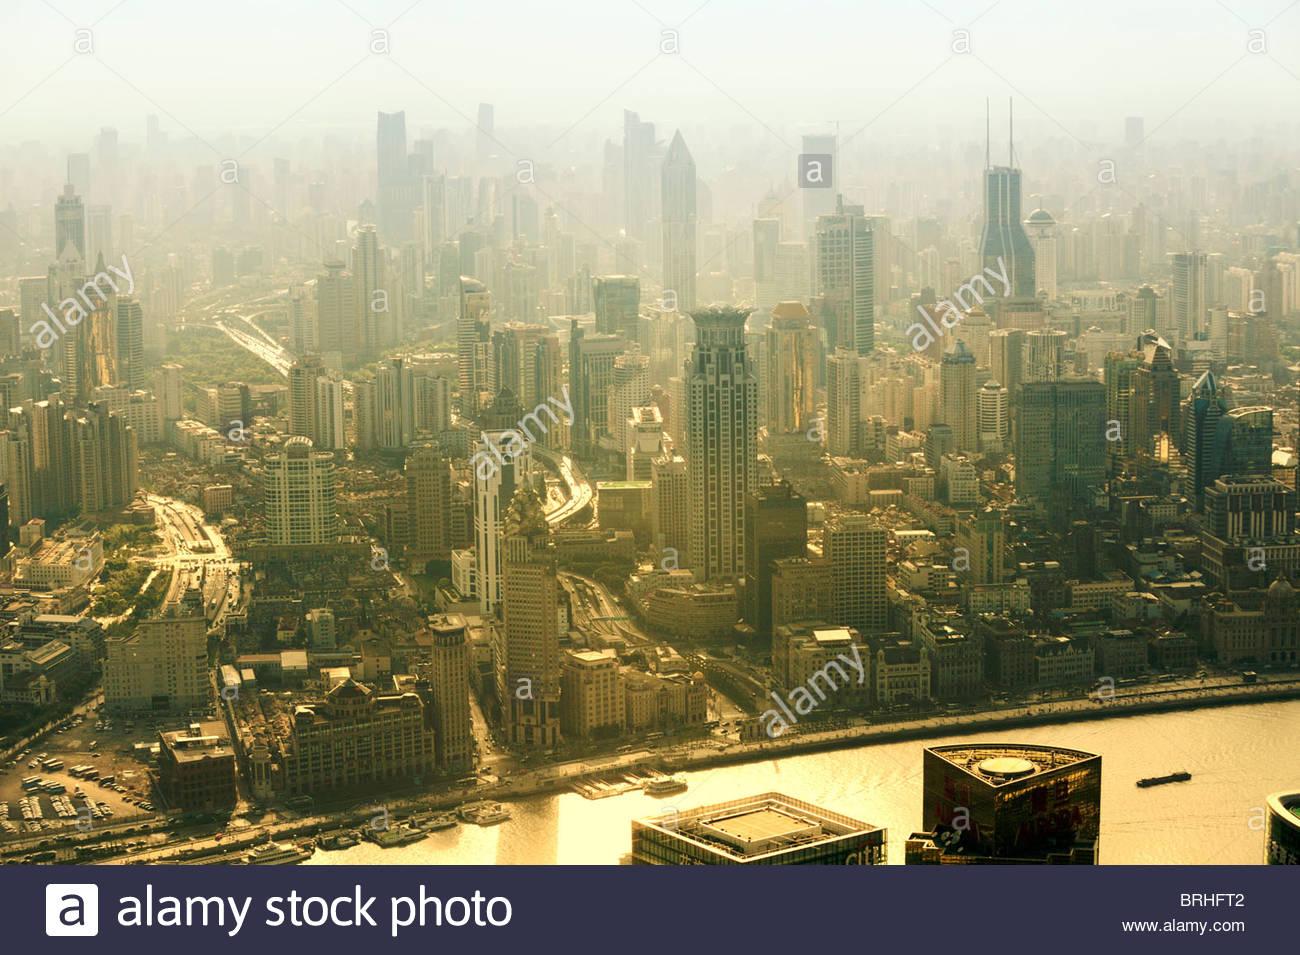 S.W über Shanghai, Zentralchina, vom Park Hyatt Hotel in Shanghai World Financial Center Tower, Pudong. Oktober Stockbild